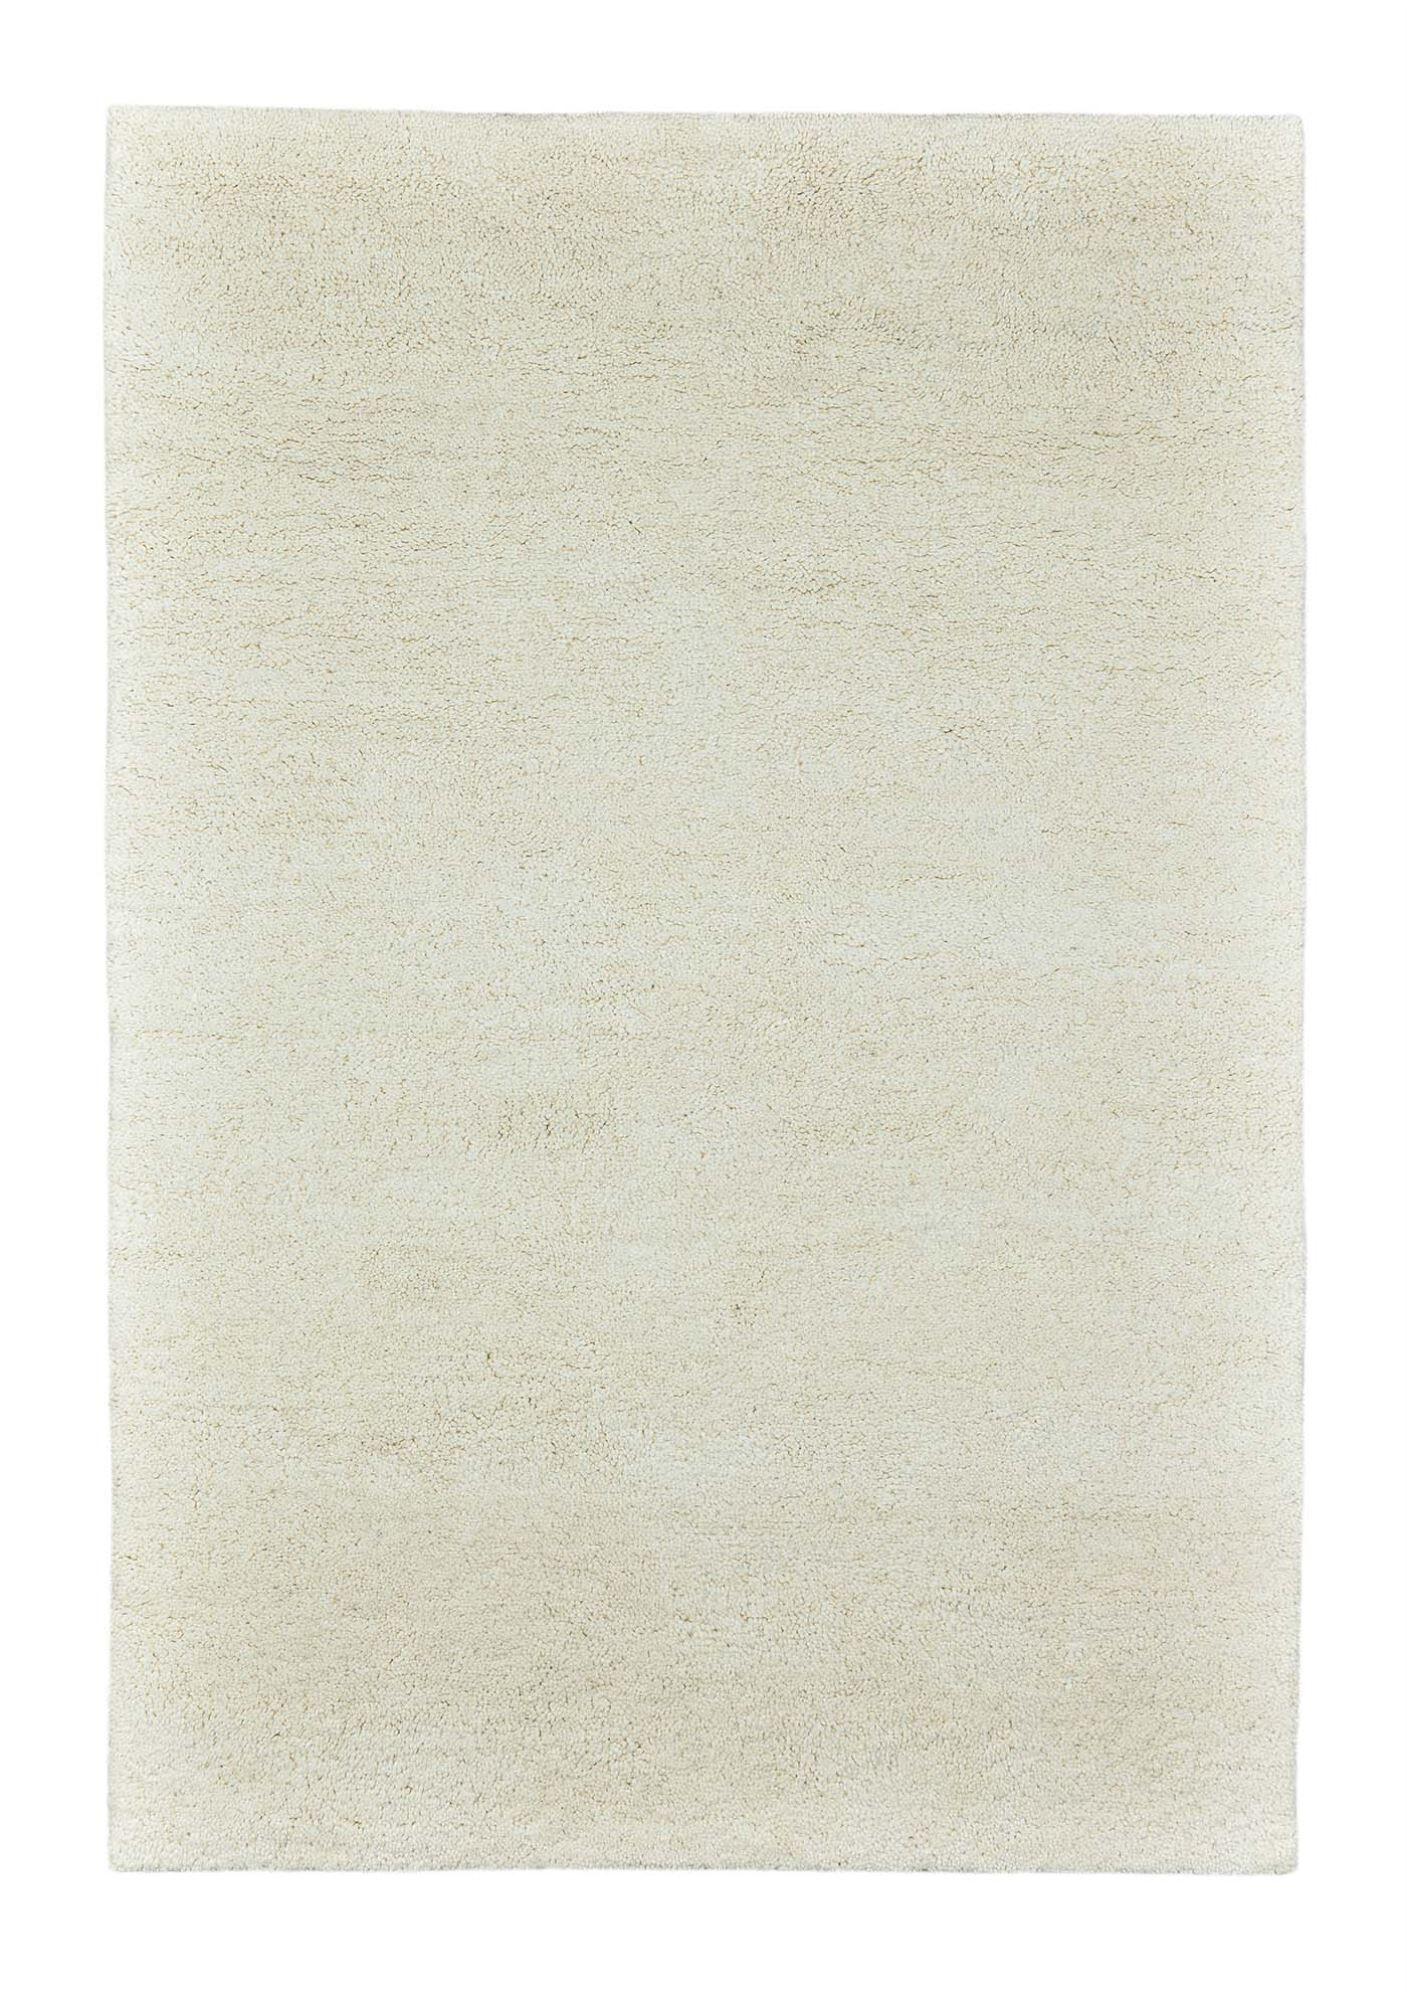 THEKO Tapis berber du maroc en laine naturelle Blanc 120x180